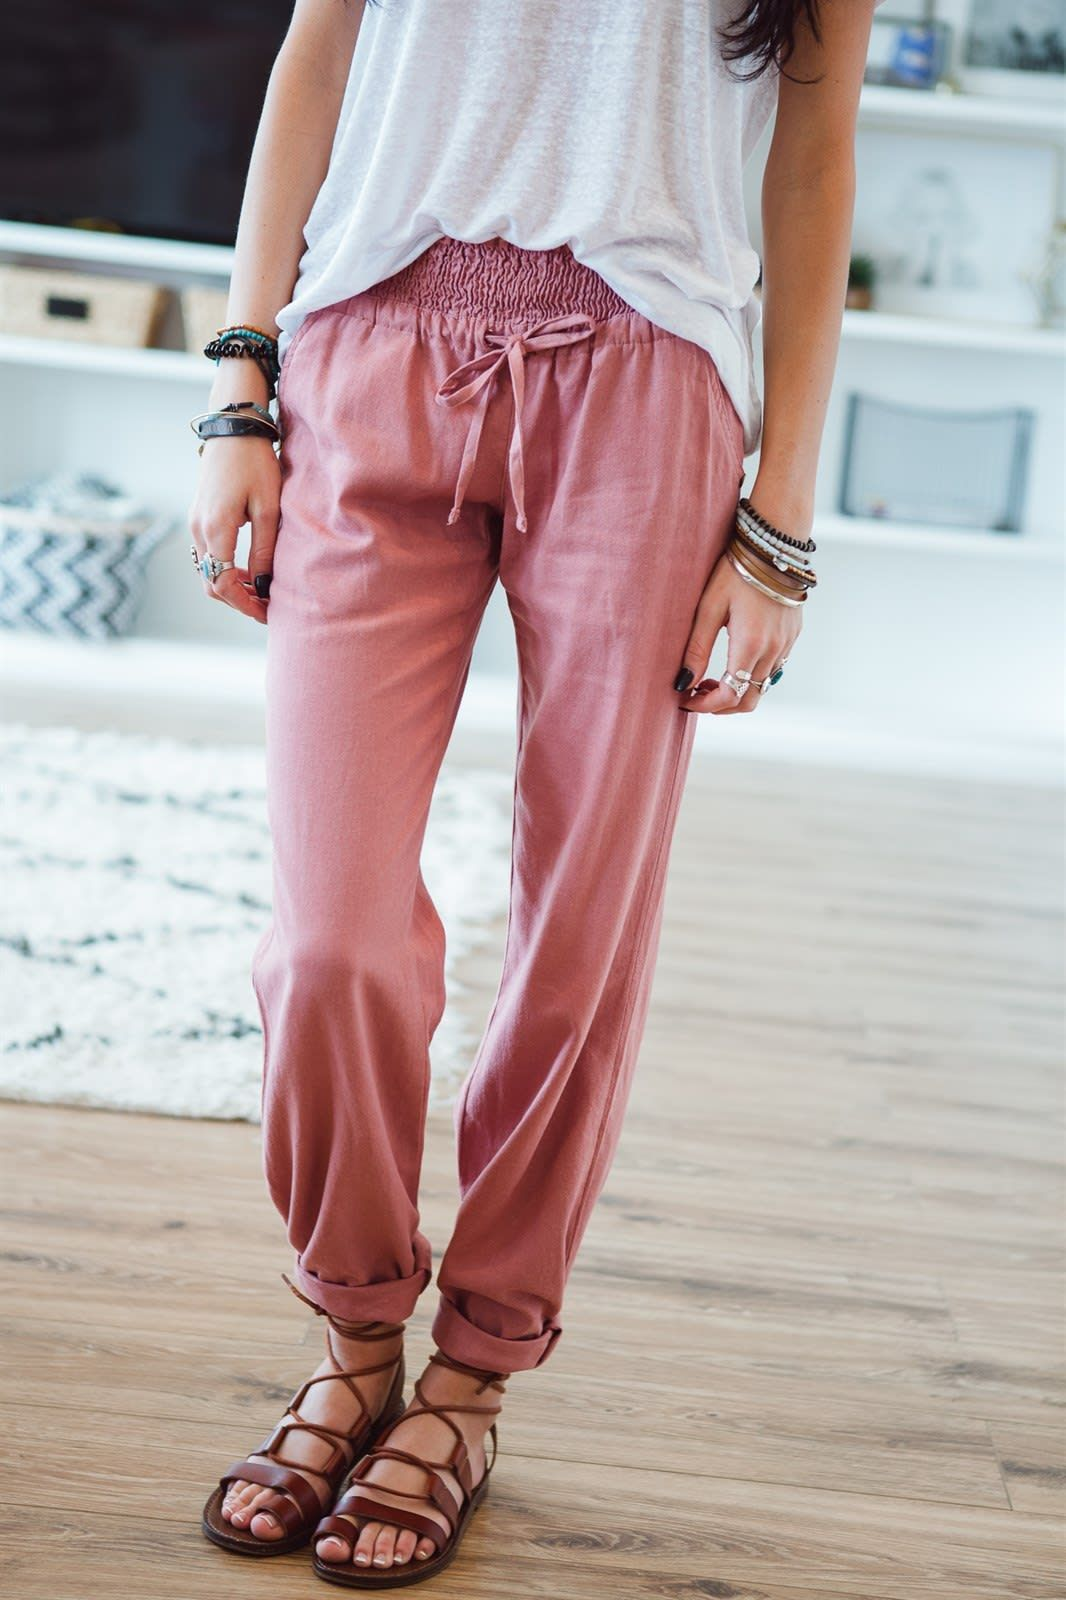 Cape Cod Beach Pants Beach Attire For Women Summer Pants Outfits Flowy Pants Outfit [ 1600 x 1066 Pixel ]